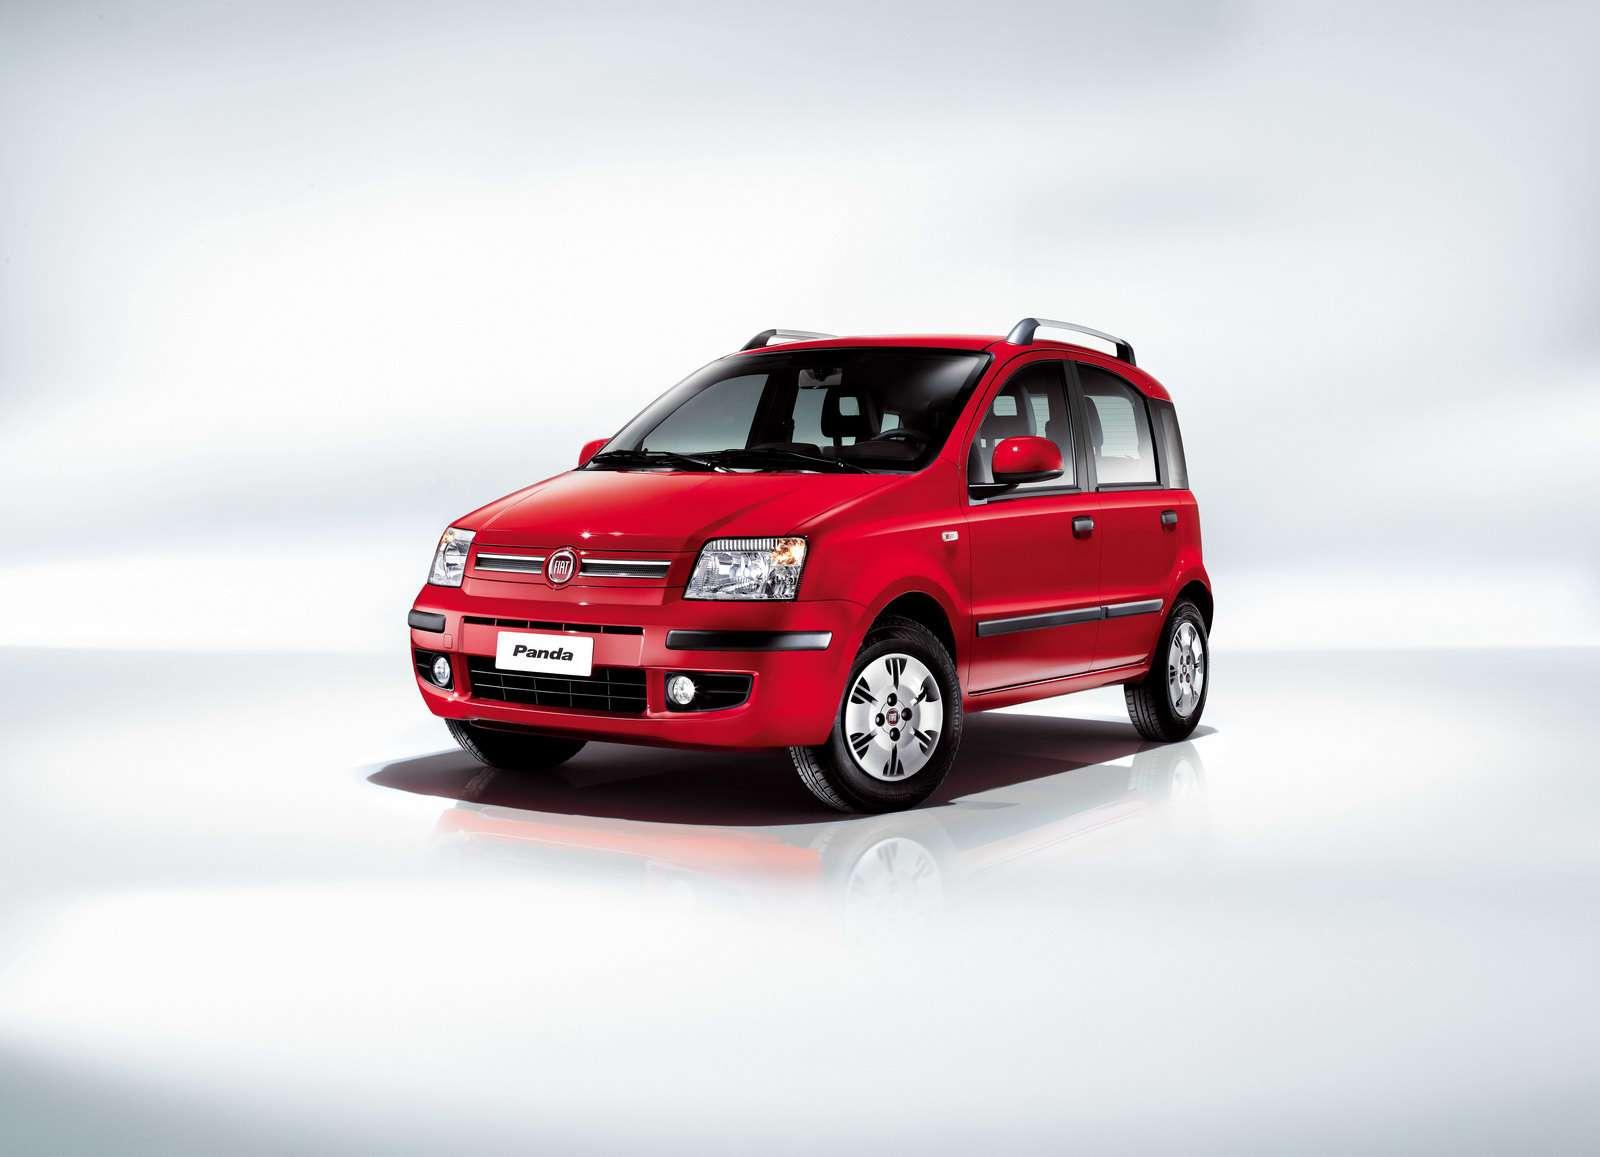 Fiat Panda Anniversary Carscoop lipiec 2010